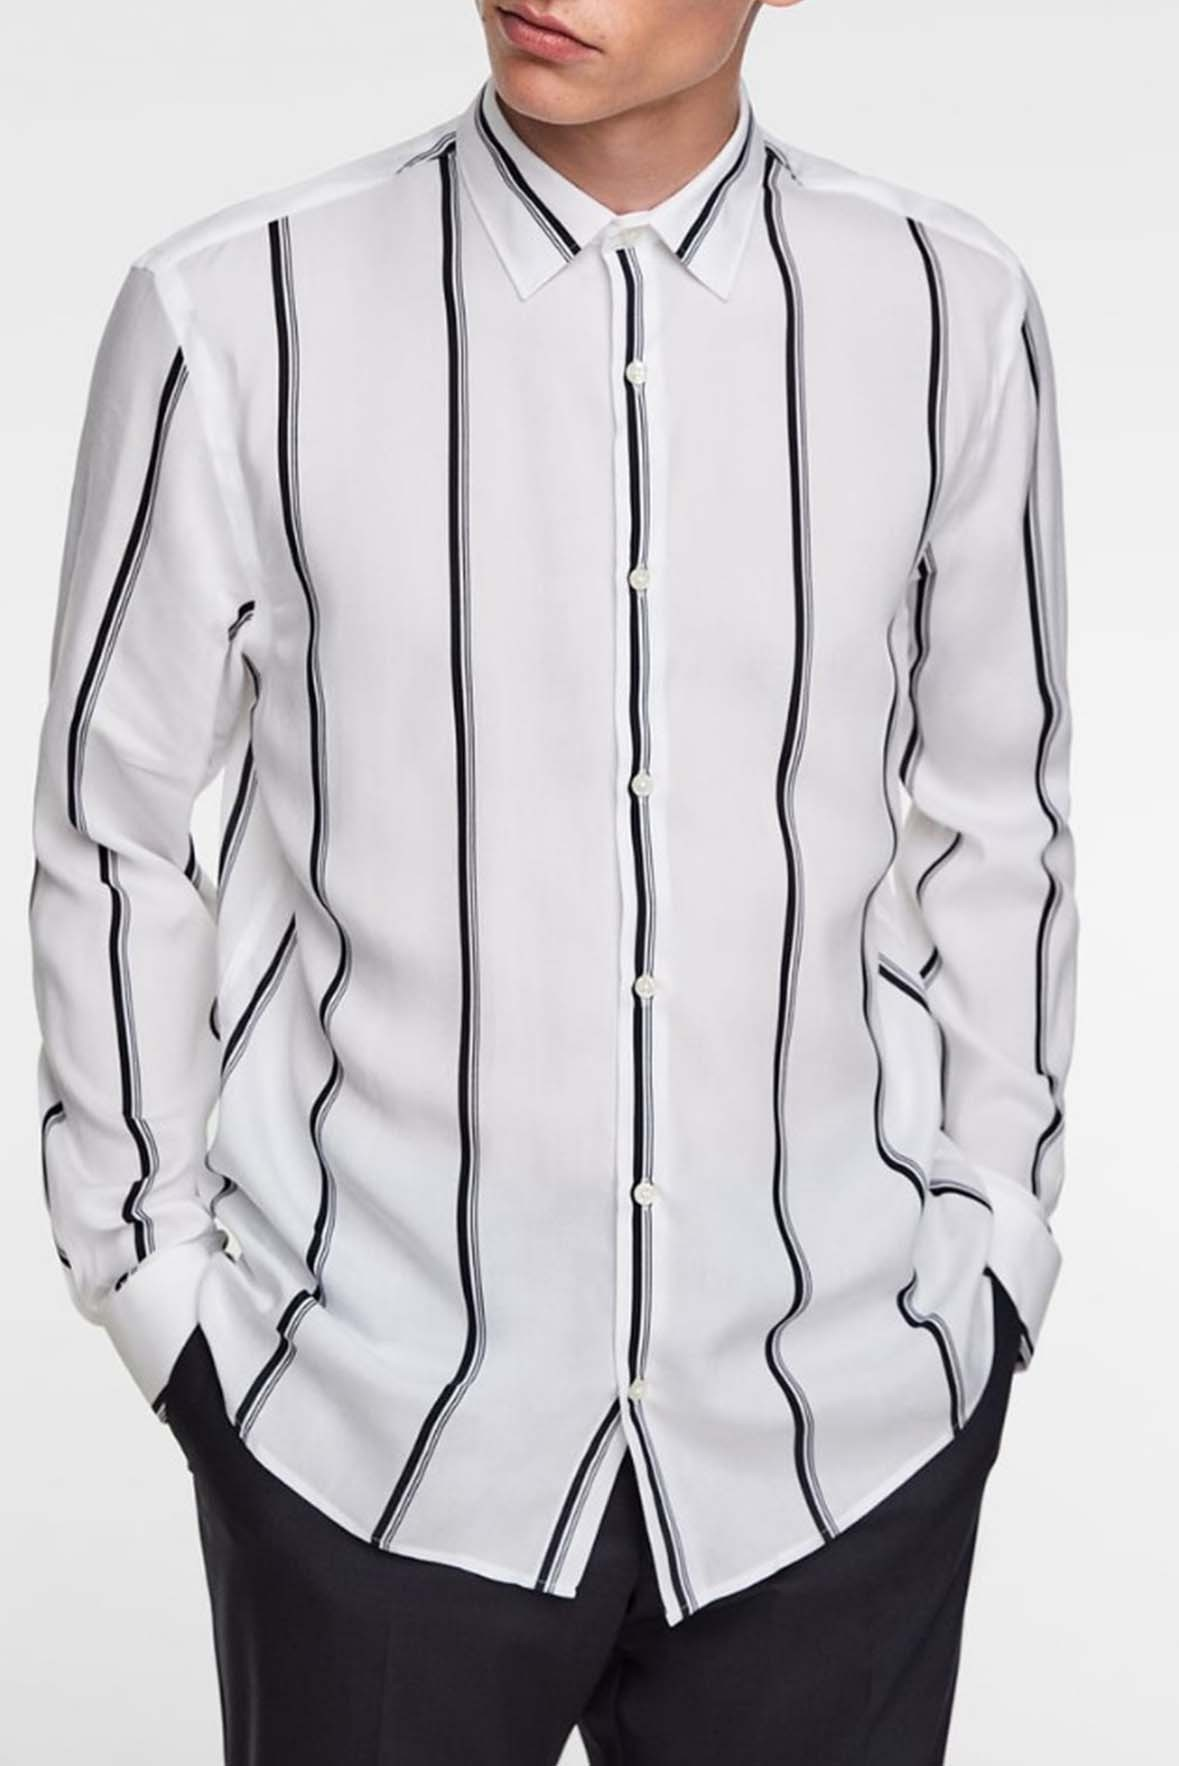 Striped Mens Shirt Black & White